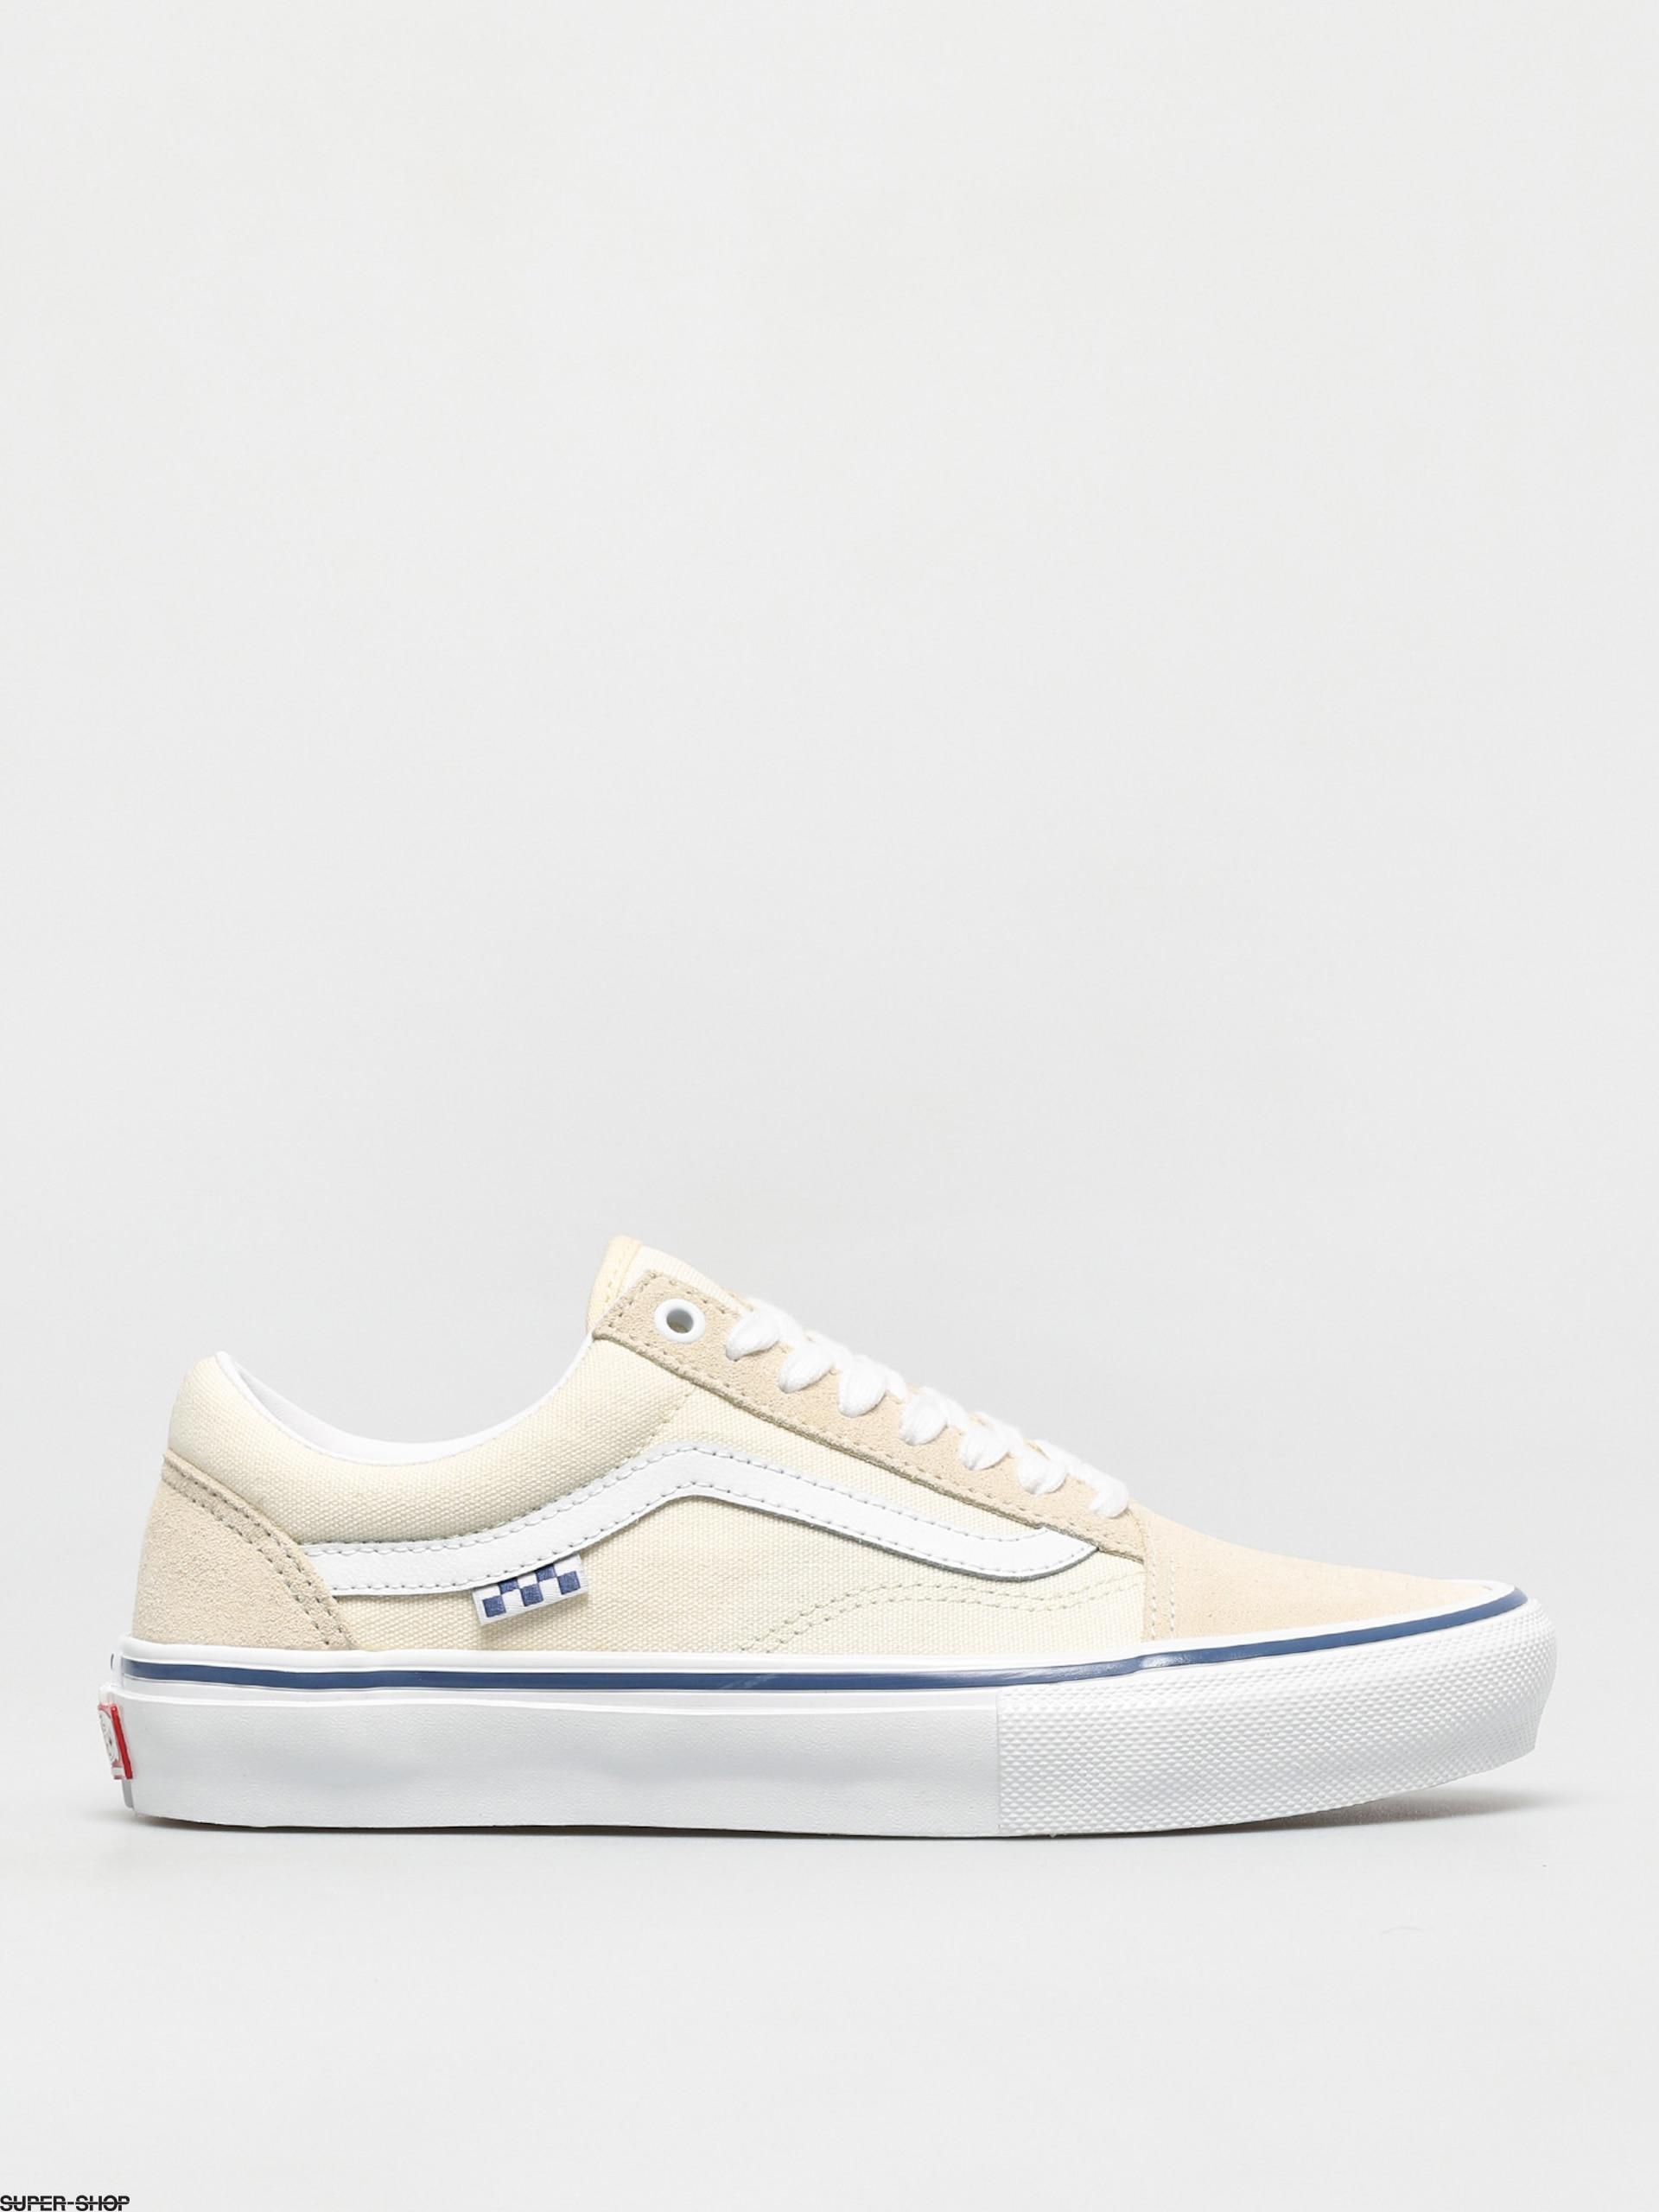 Vans Skate Old Skool Shoes (off white)